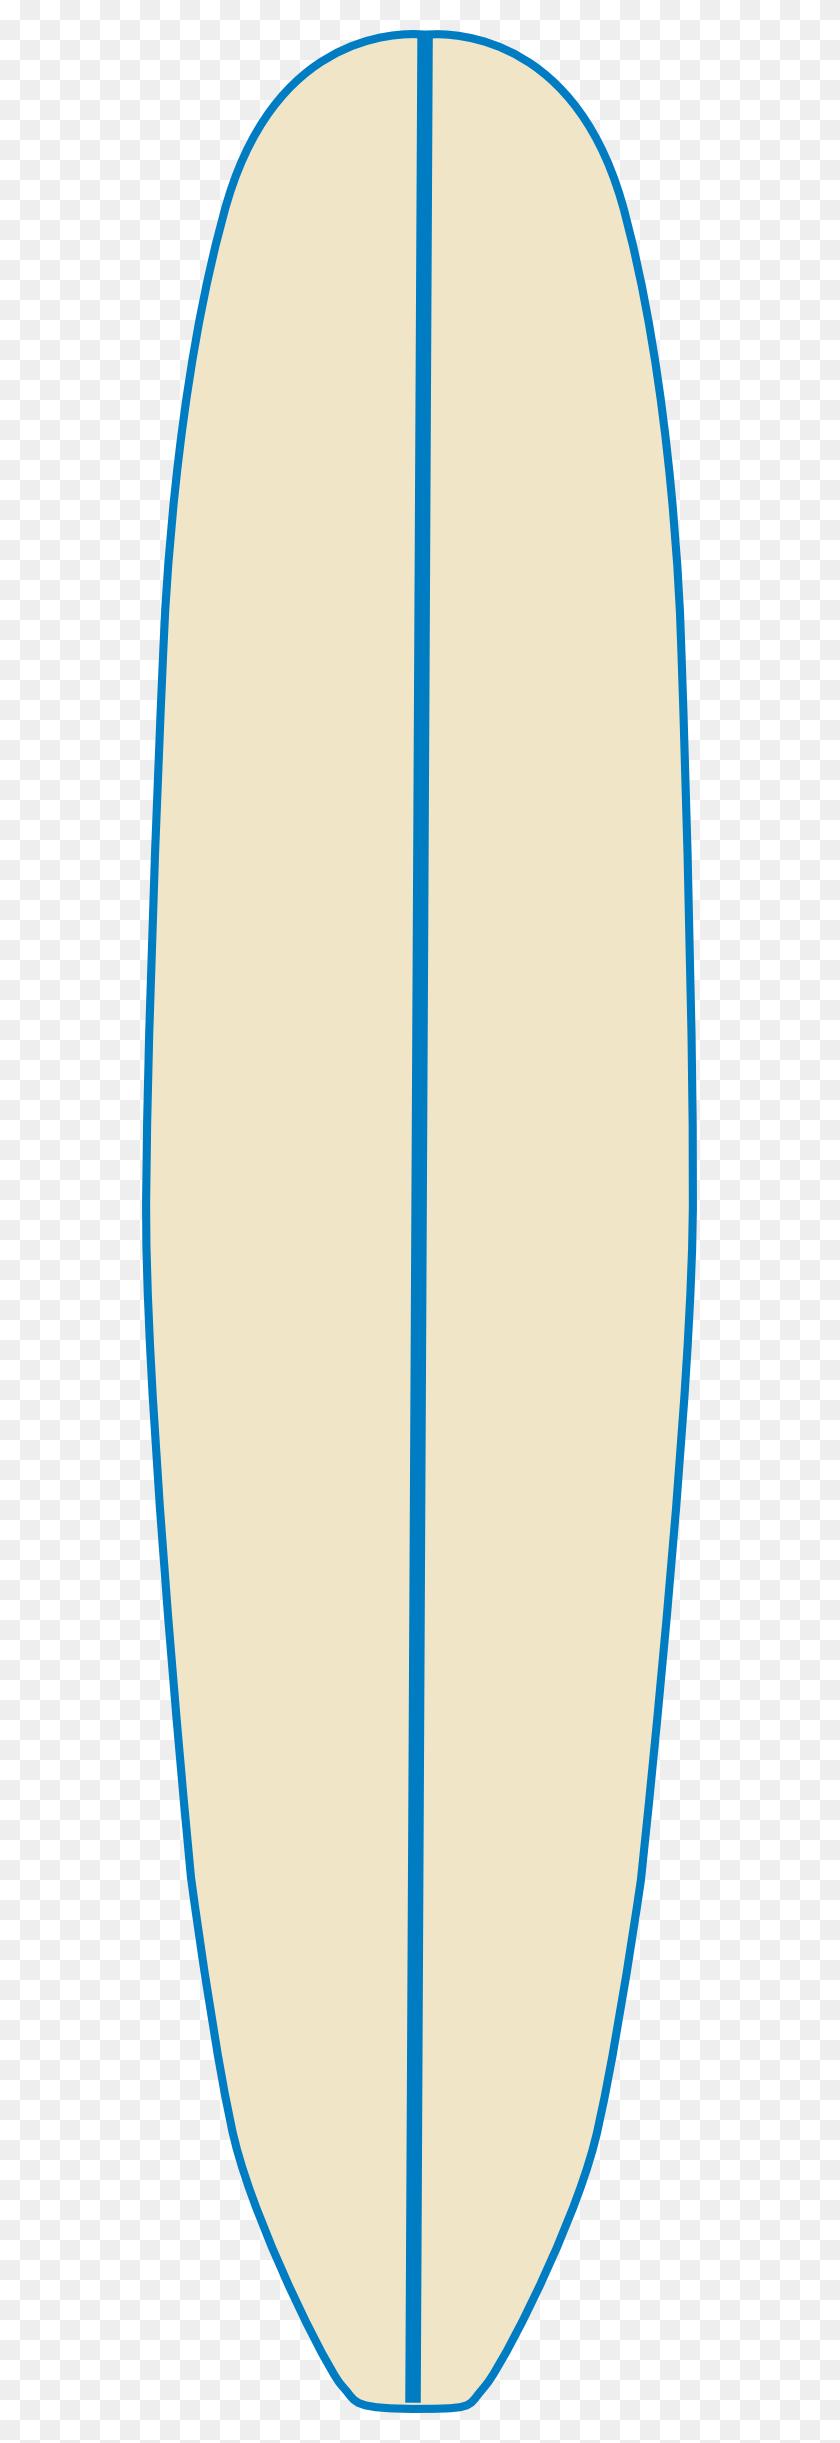 Surfboard Clipart The Cliparts - Surfboard Clipart